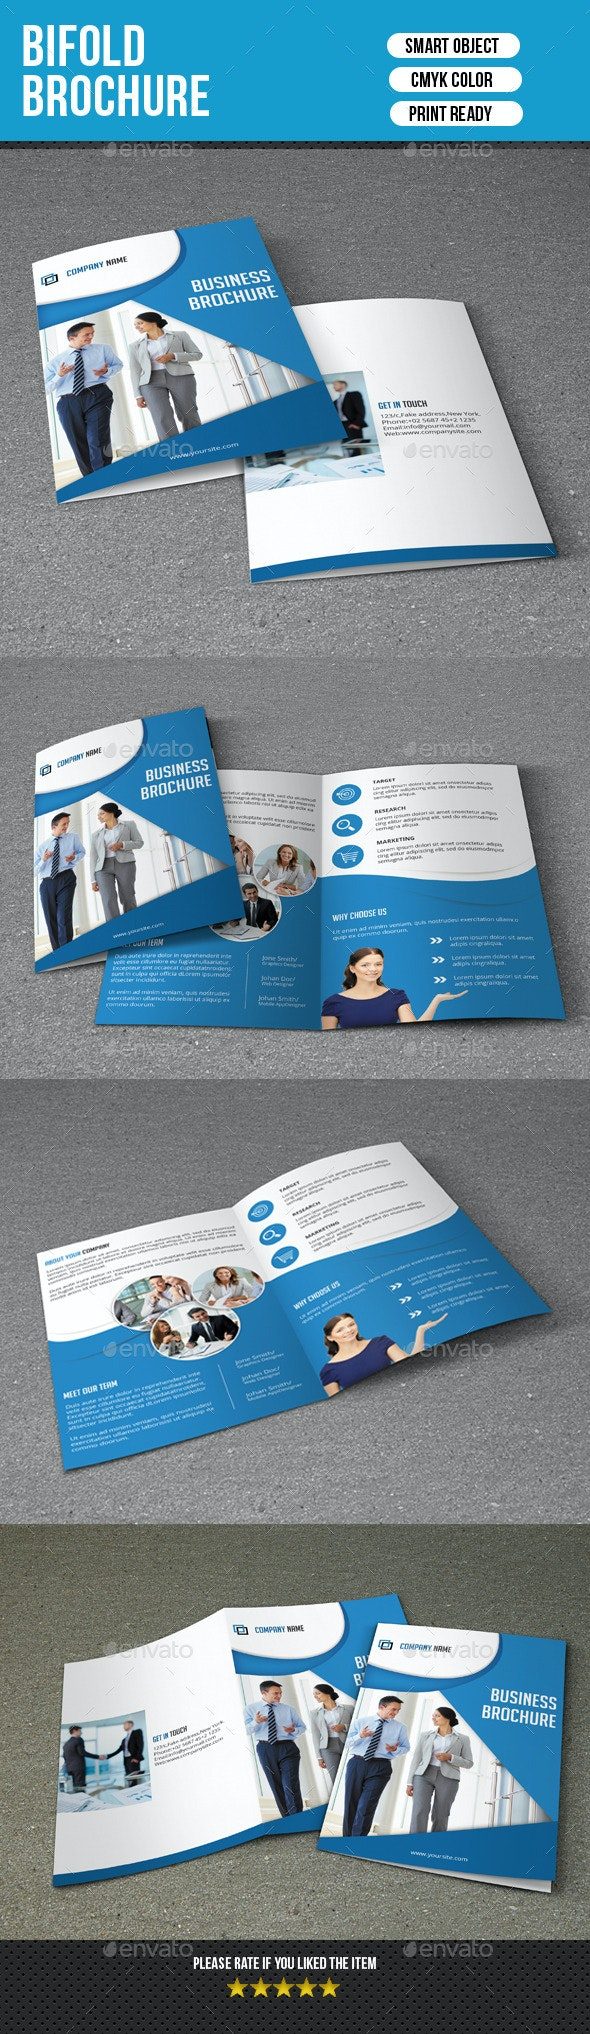 Bifold Brochure for Business-V126 - Corporate Brochures